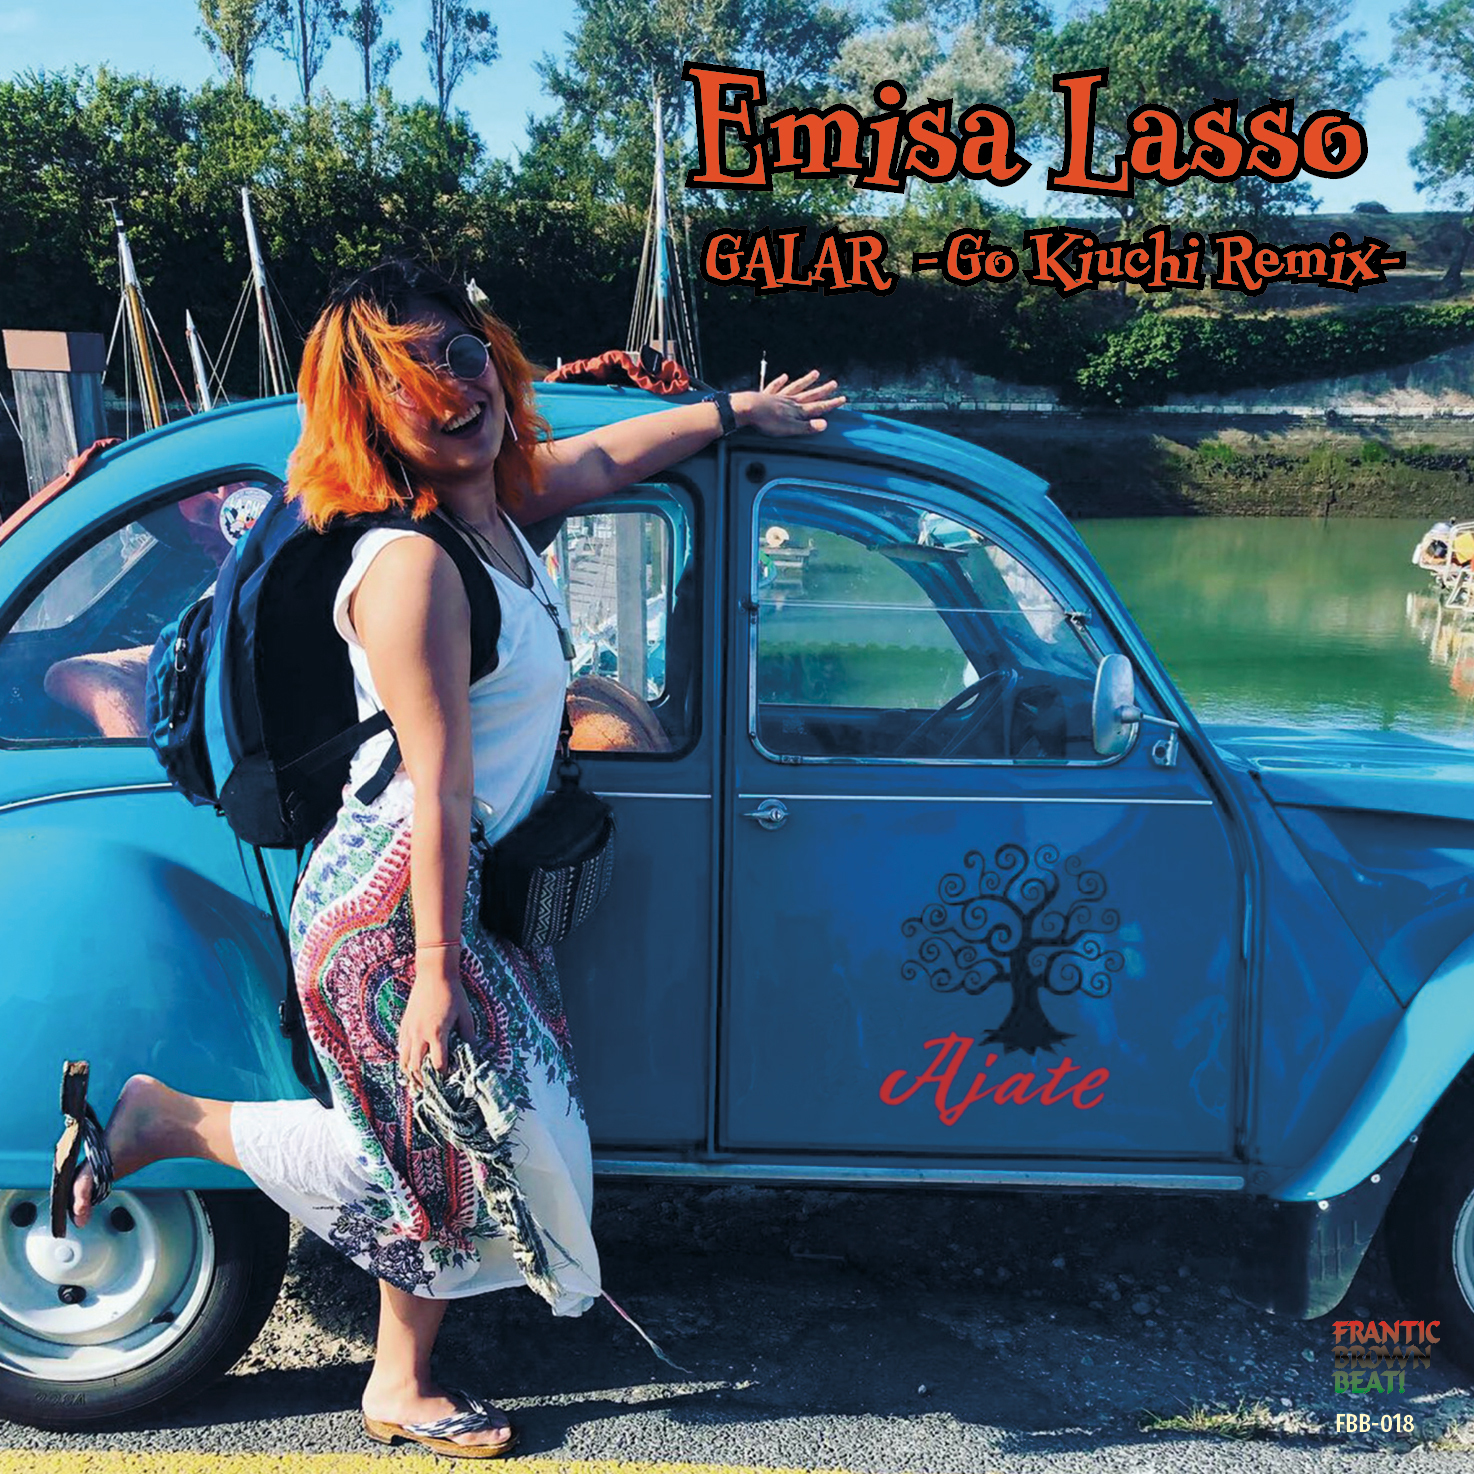 AJATE / Emisa Lasso + Galar Go Kiuchi Mix